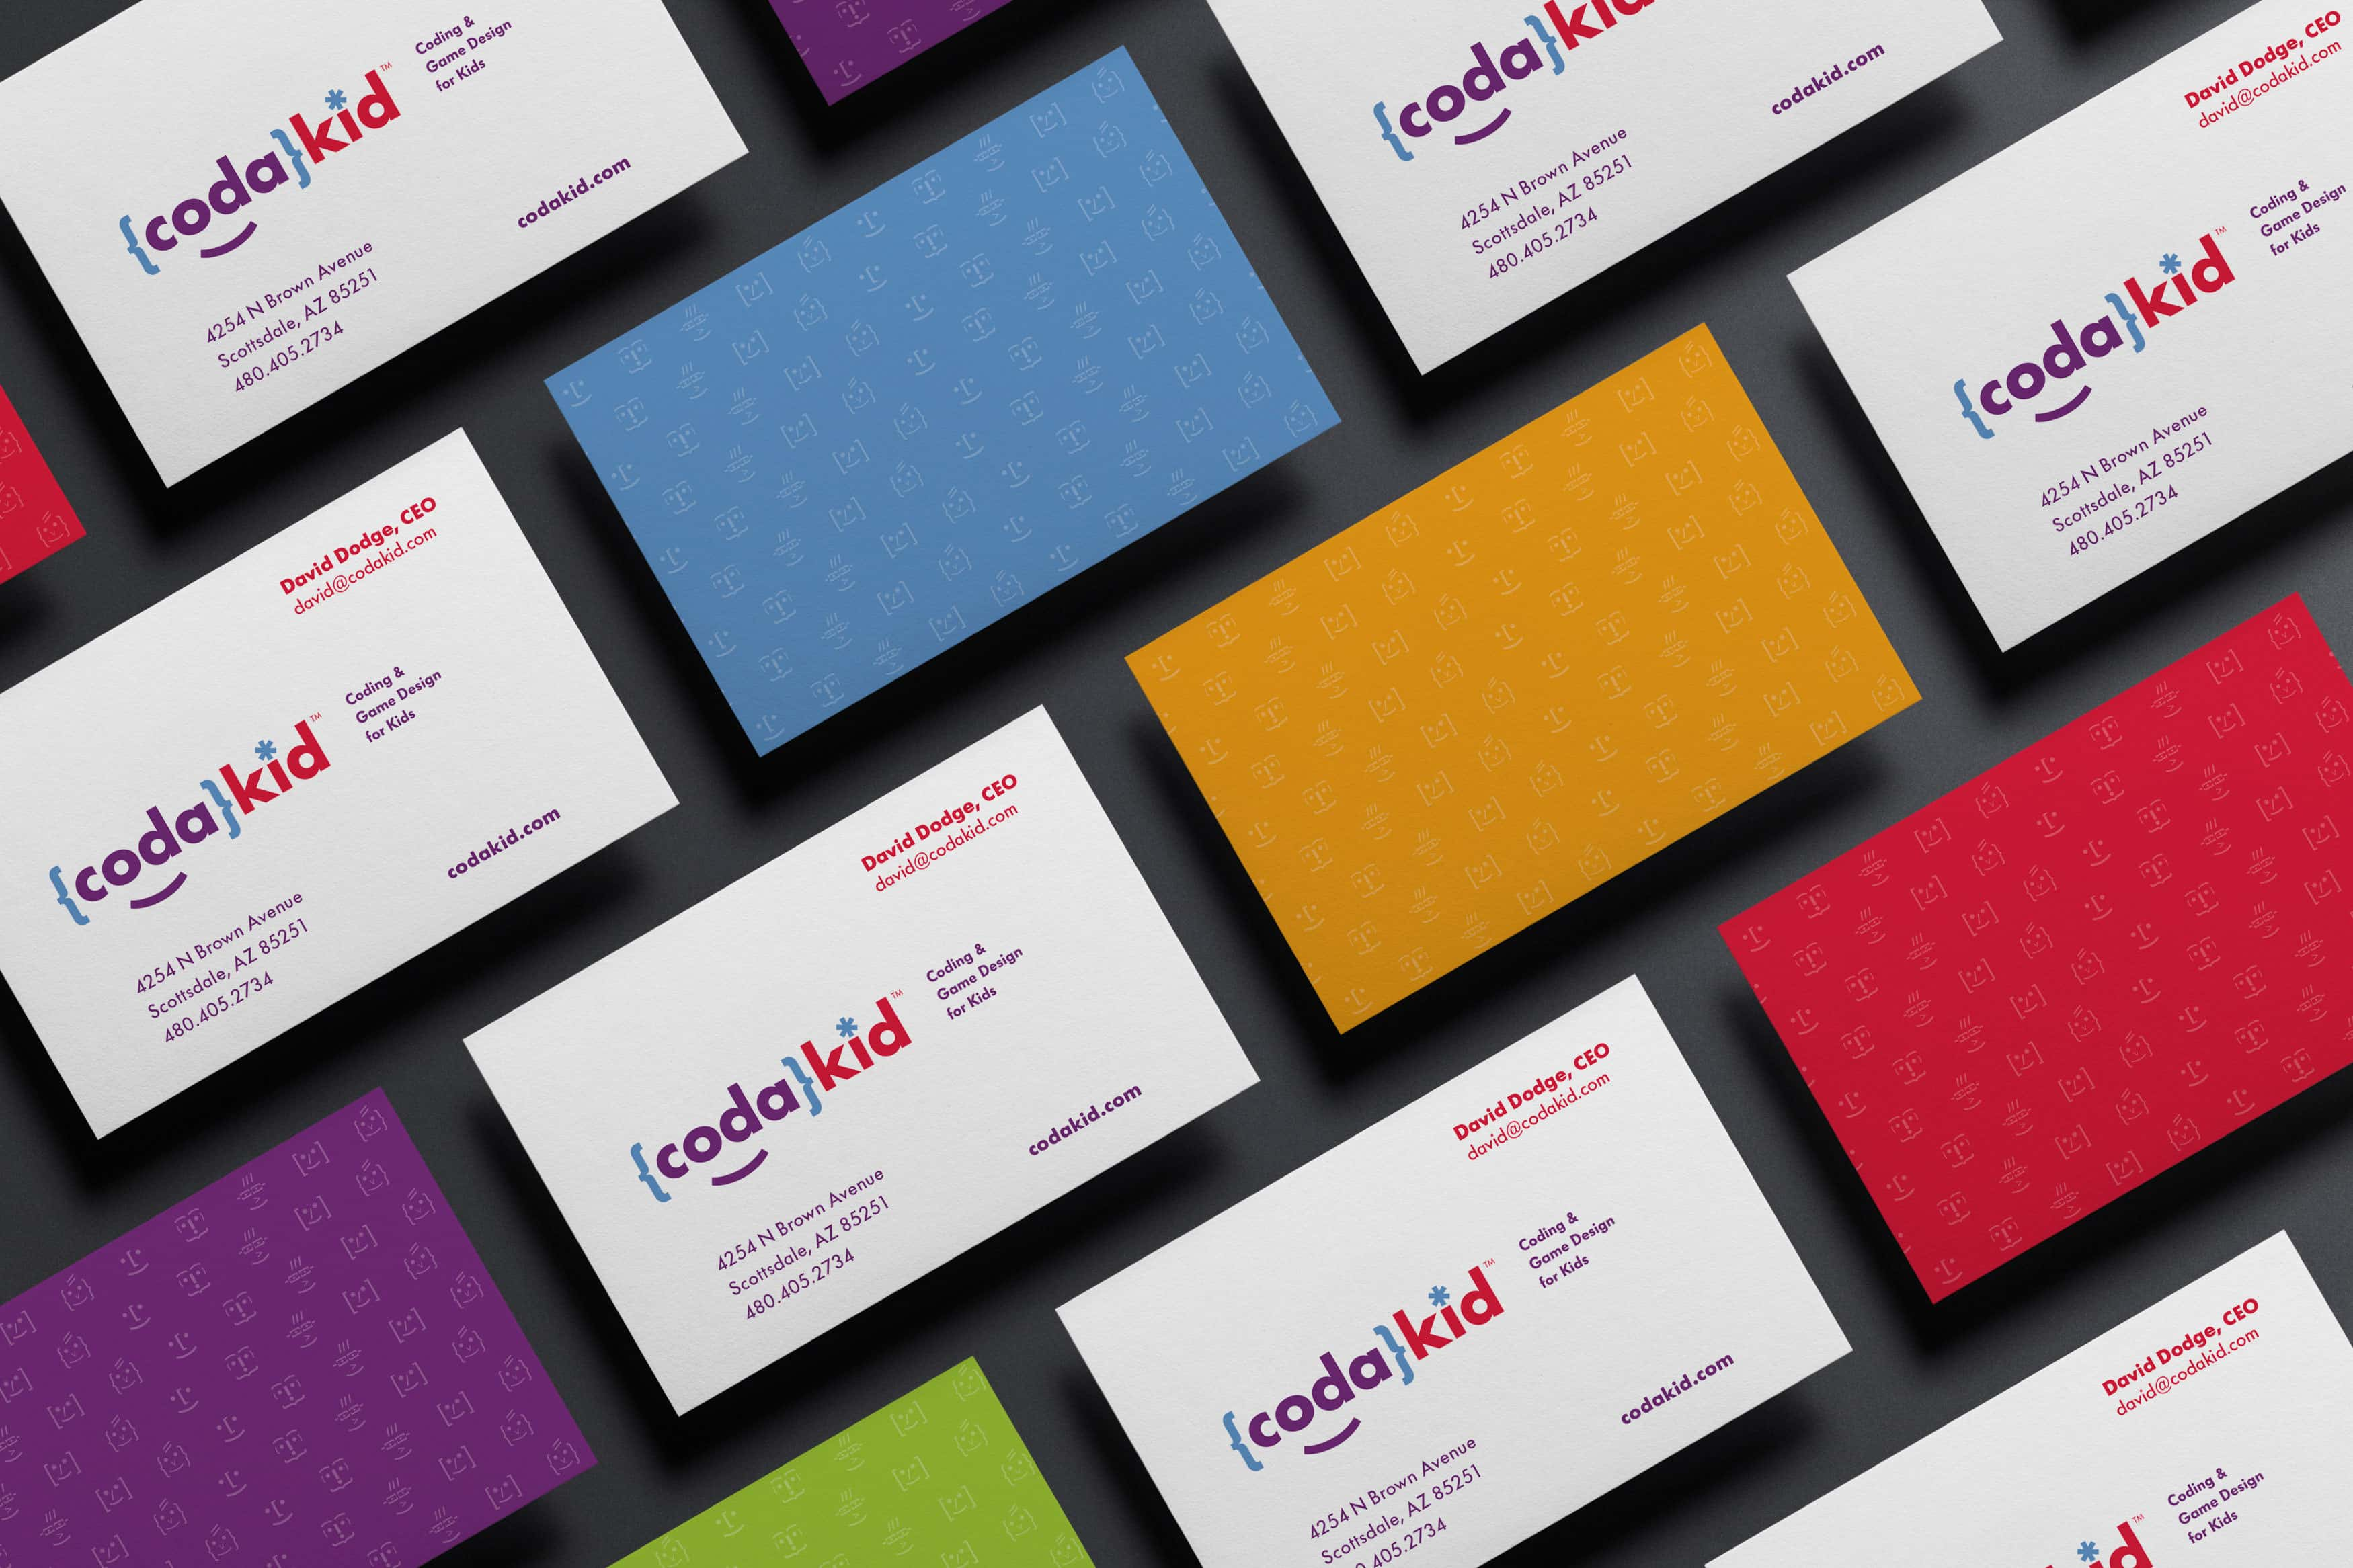 CodaKid Rebrand Application Business Cards